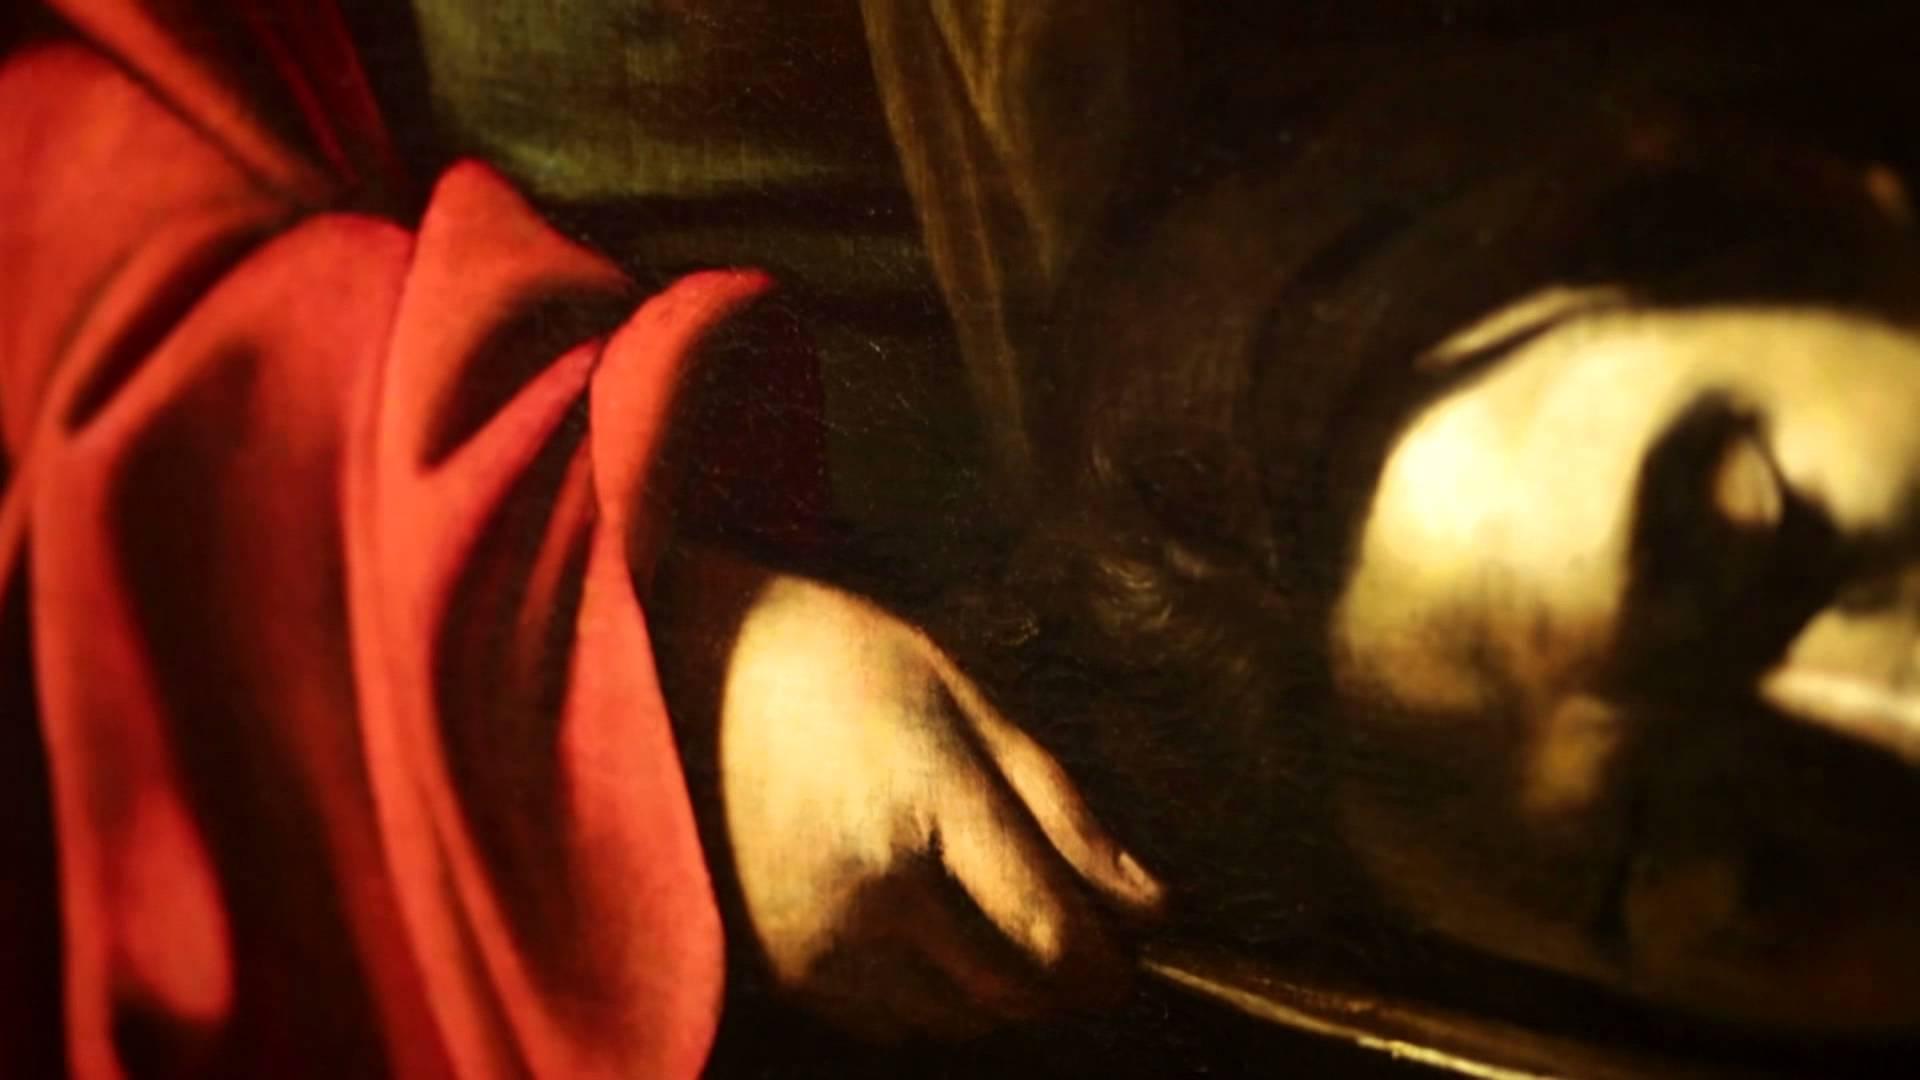 「卡拉瓦喬:〈莎樂美接收施洗者約翰的頭〉」- Caravaggio: Salome receives the Head of Saint John the Baptist